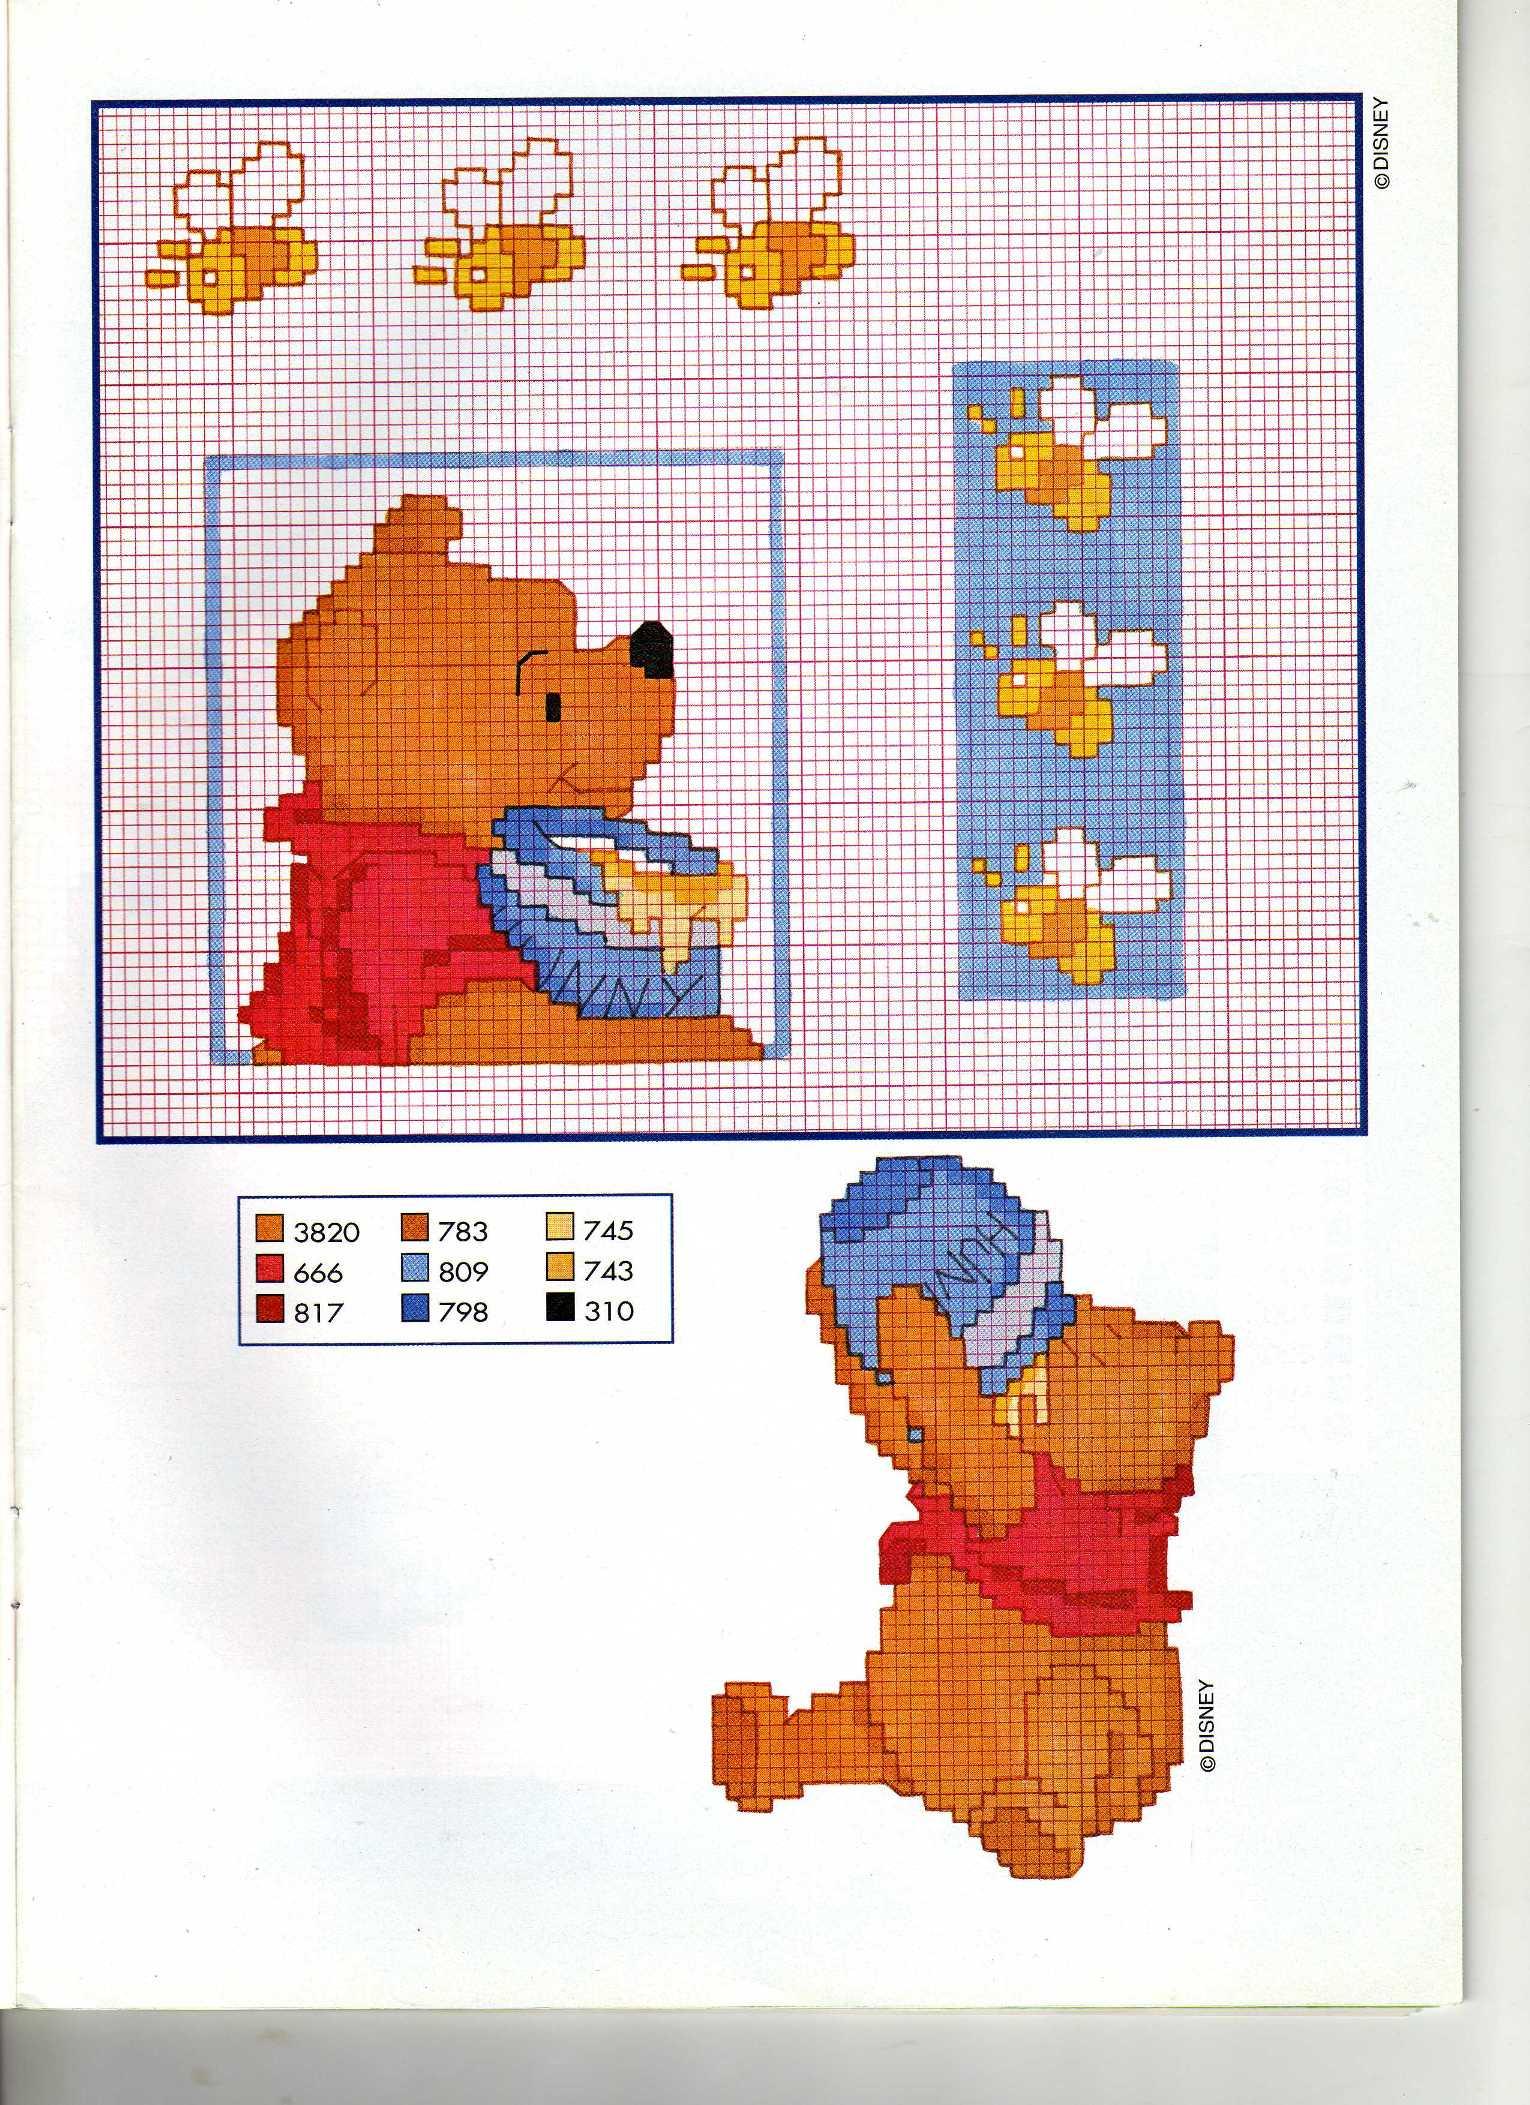 Winnie the pooh con barattolo miele e api for Punto croce disney winnie the pooh